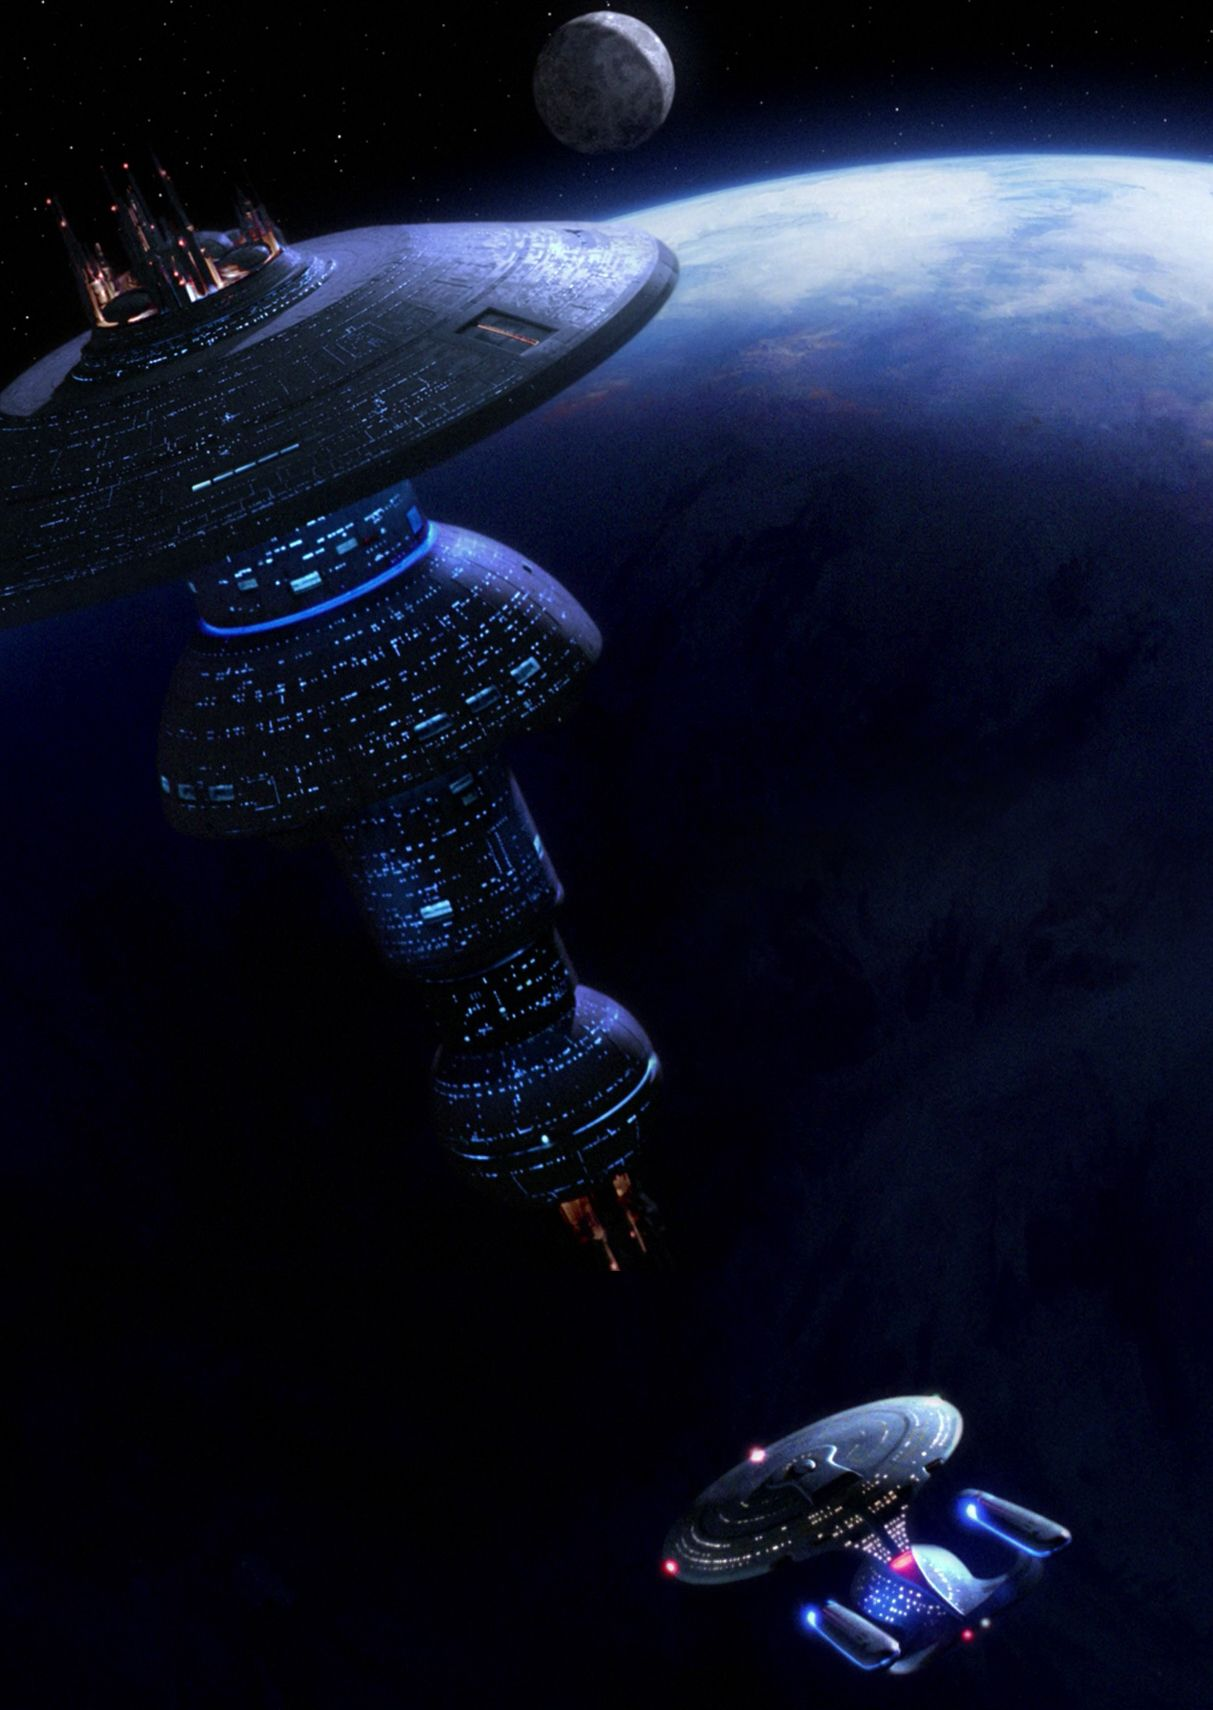 Uss enterprise ncc 1701 d galaxy class saucer separation r flickr - Design A Spaceship Uss Enterprise Approaching Starbase